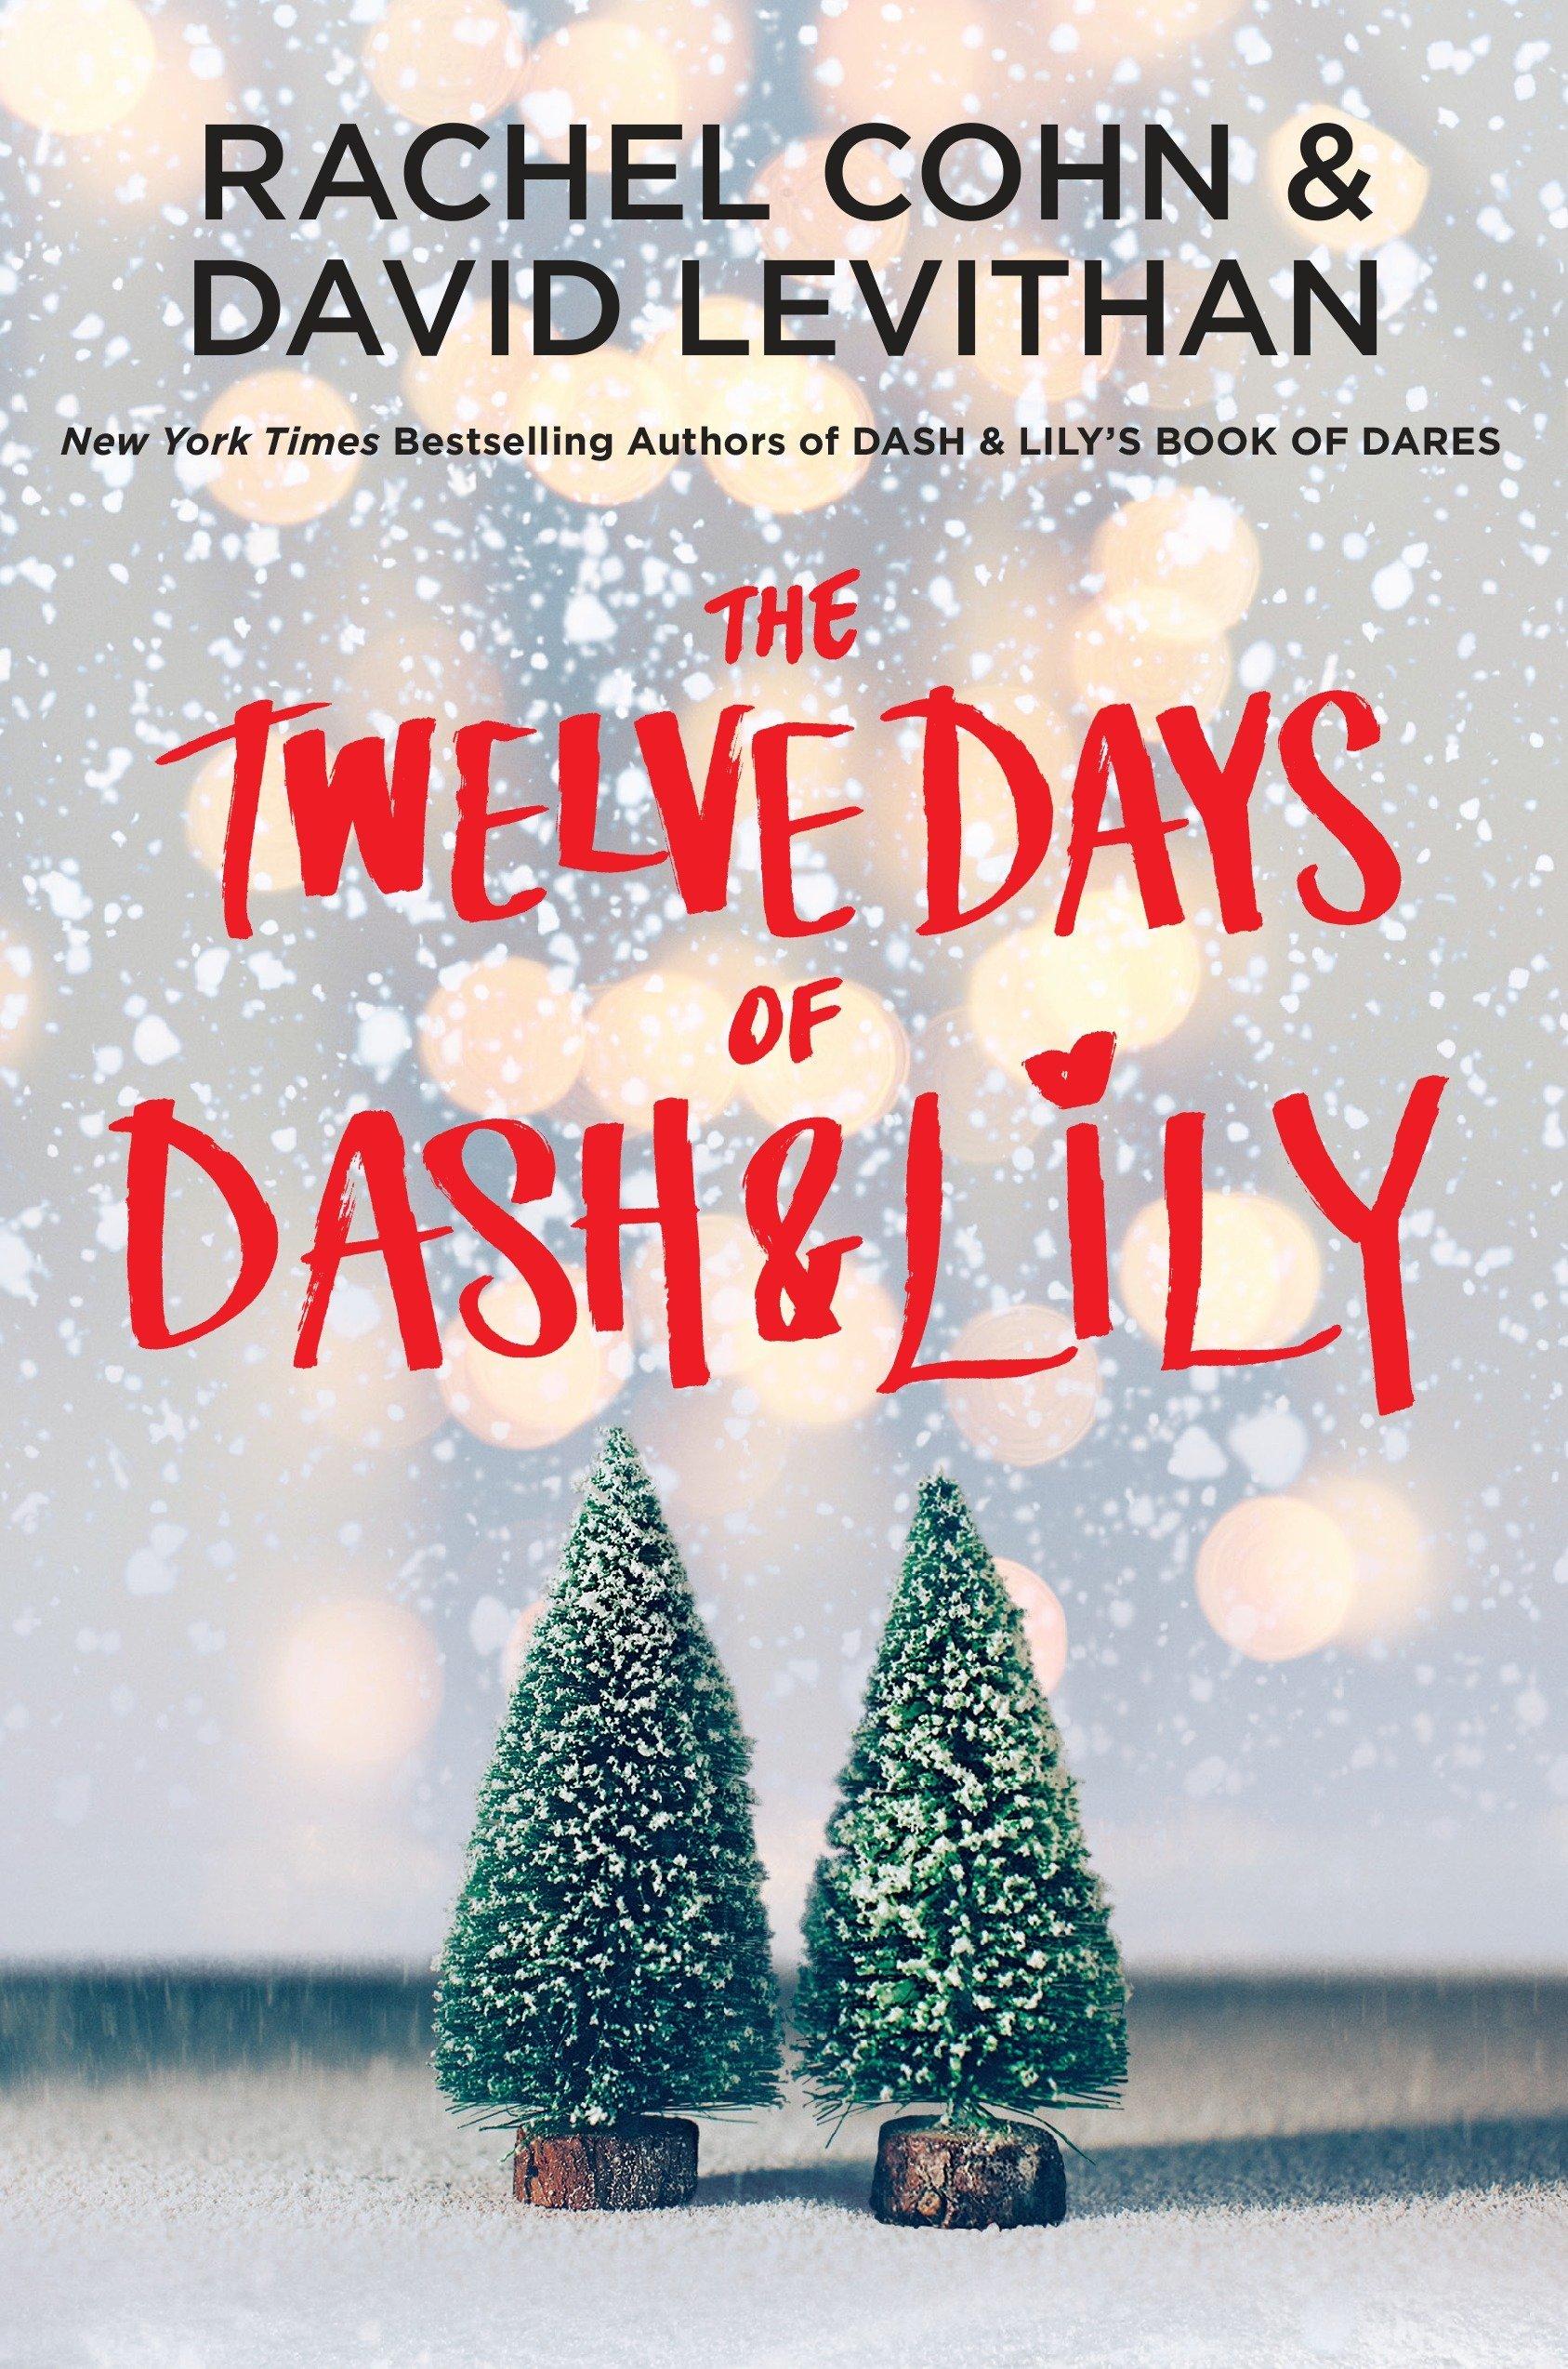 Amazon.com: The Twelve Days of Dash & Lily (Dash & Lily Series)  (9780399553806): Cohn, Rachel, Levithan, David: Books